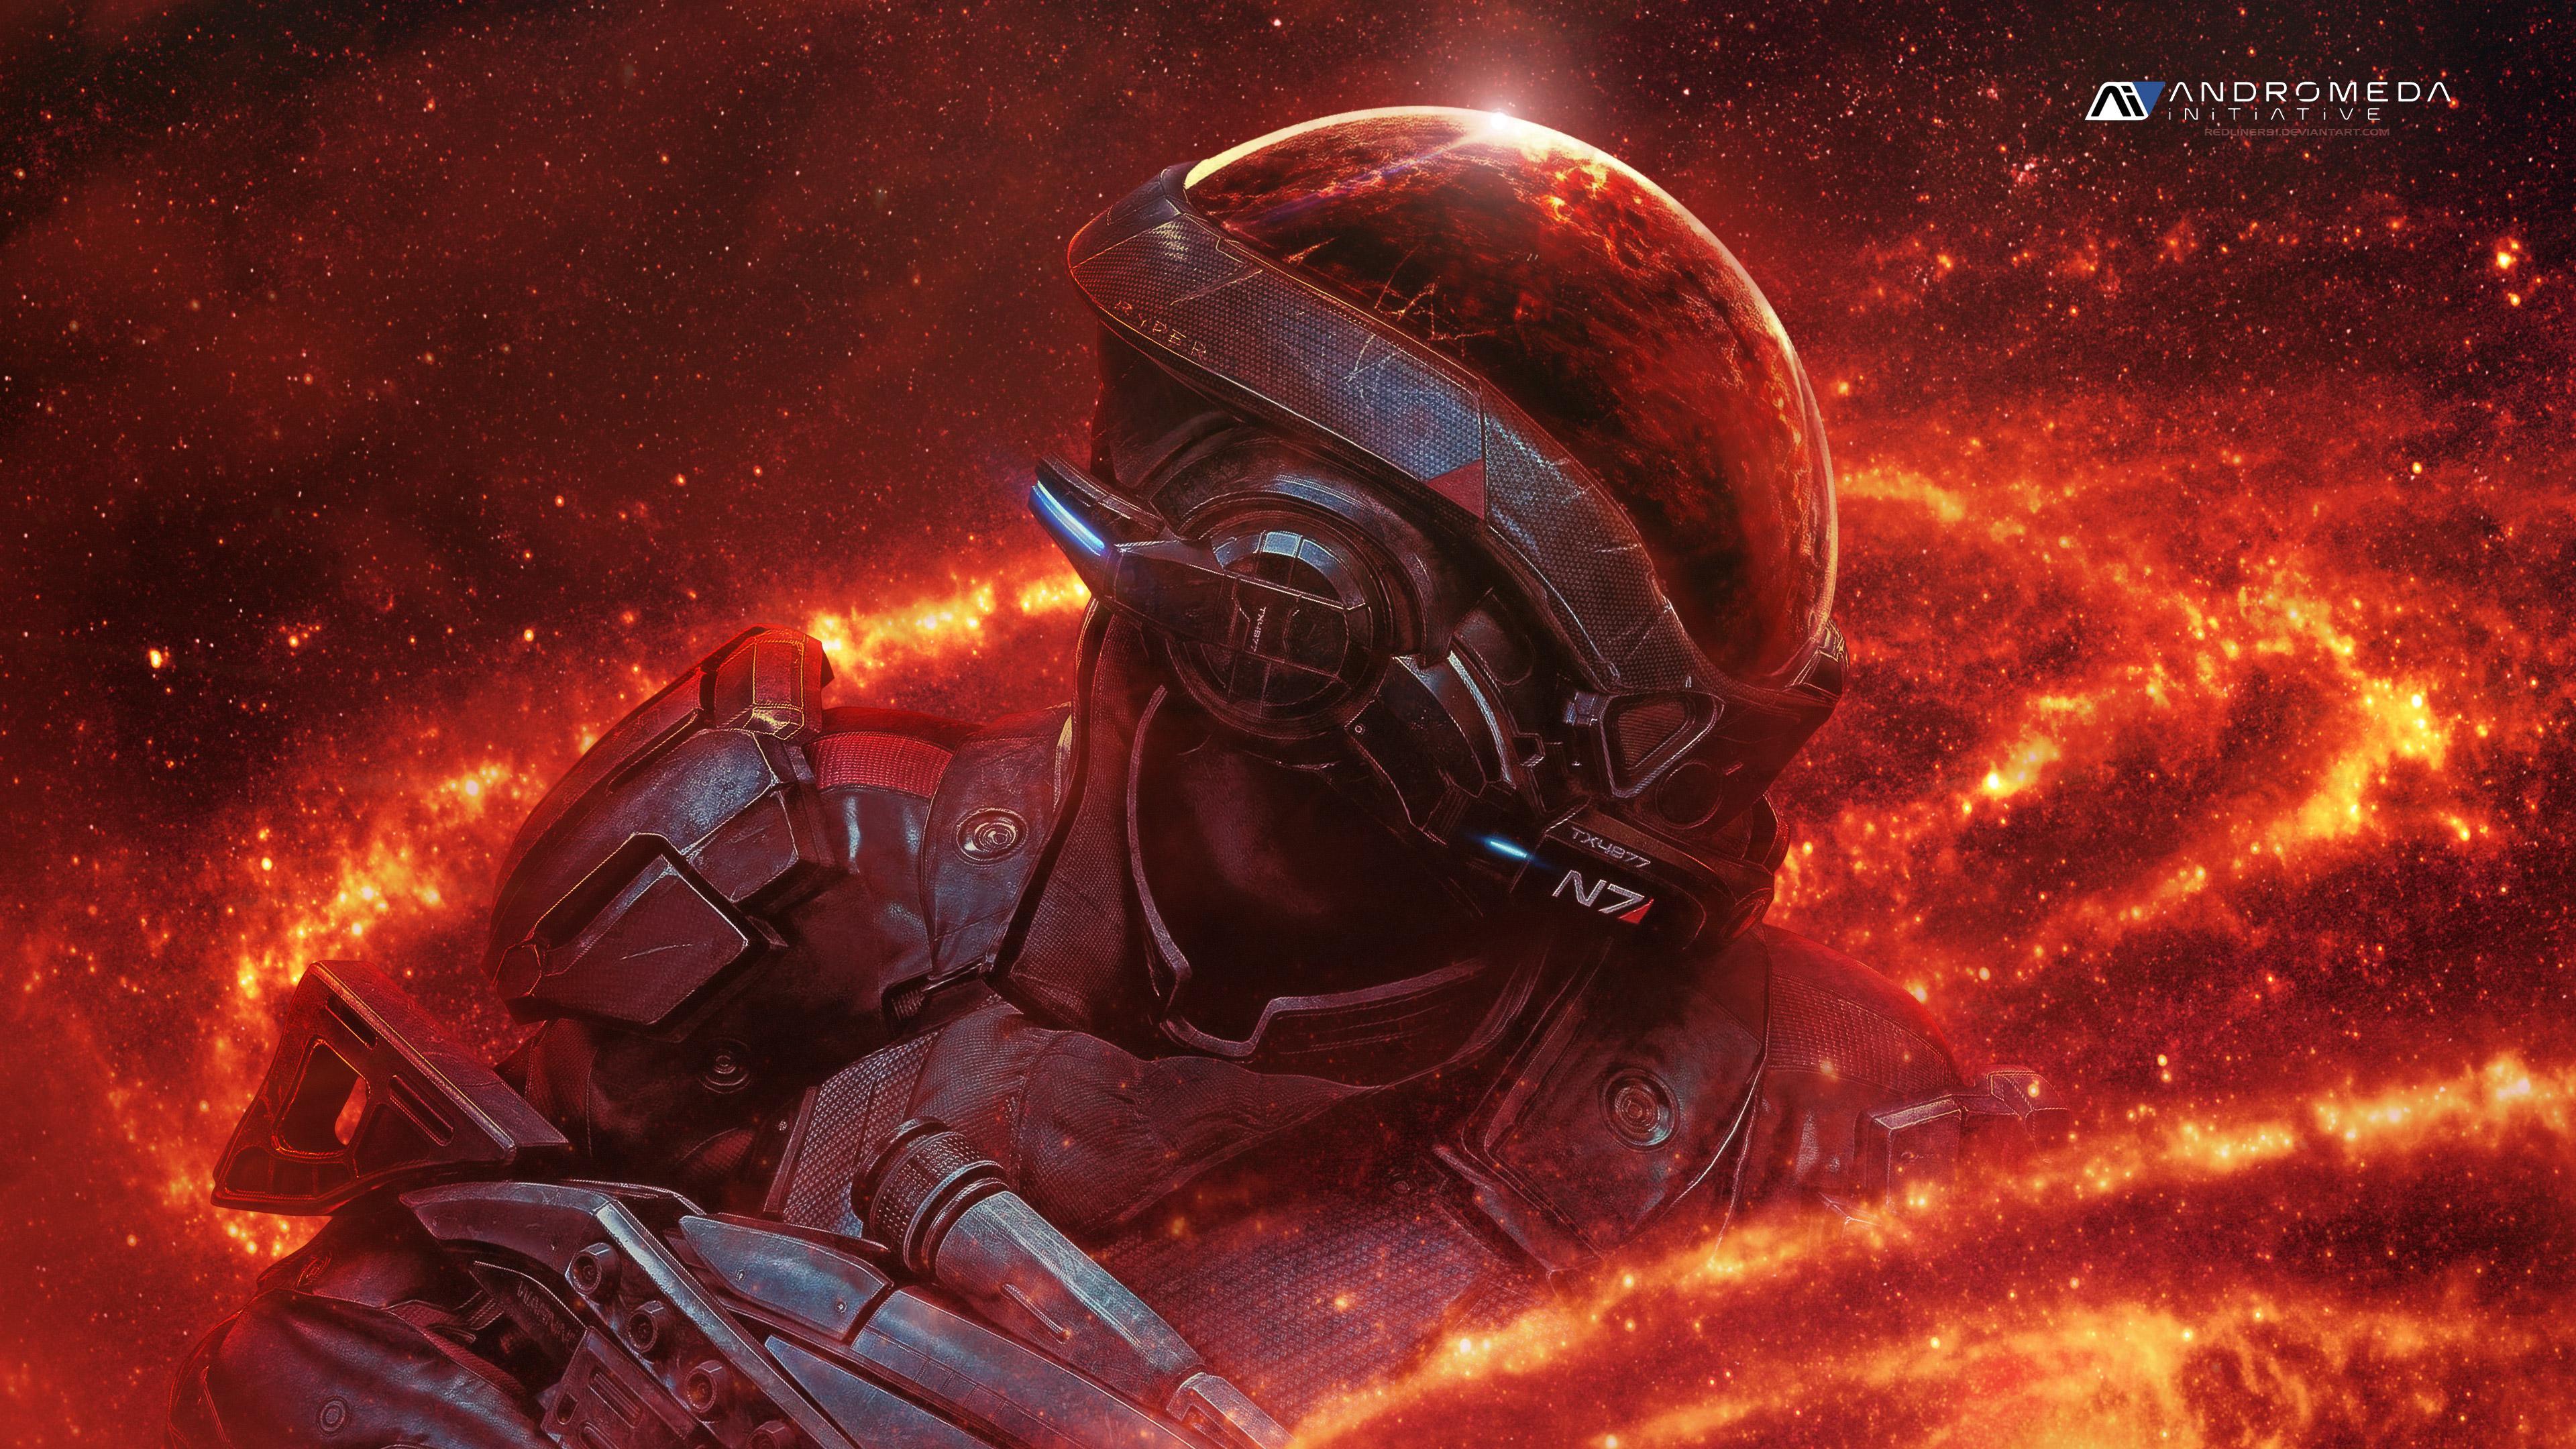 Mass Effect Andromeda Ryder N7 4k Hd Games 4k Wallpapers